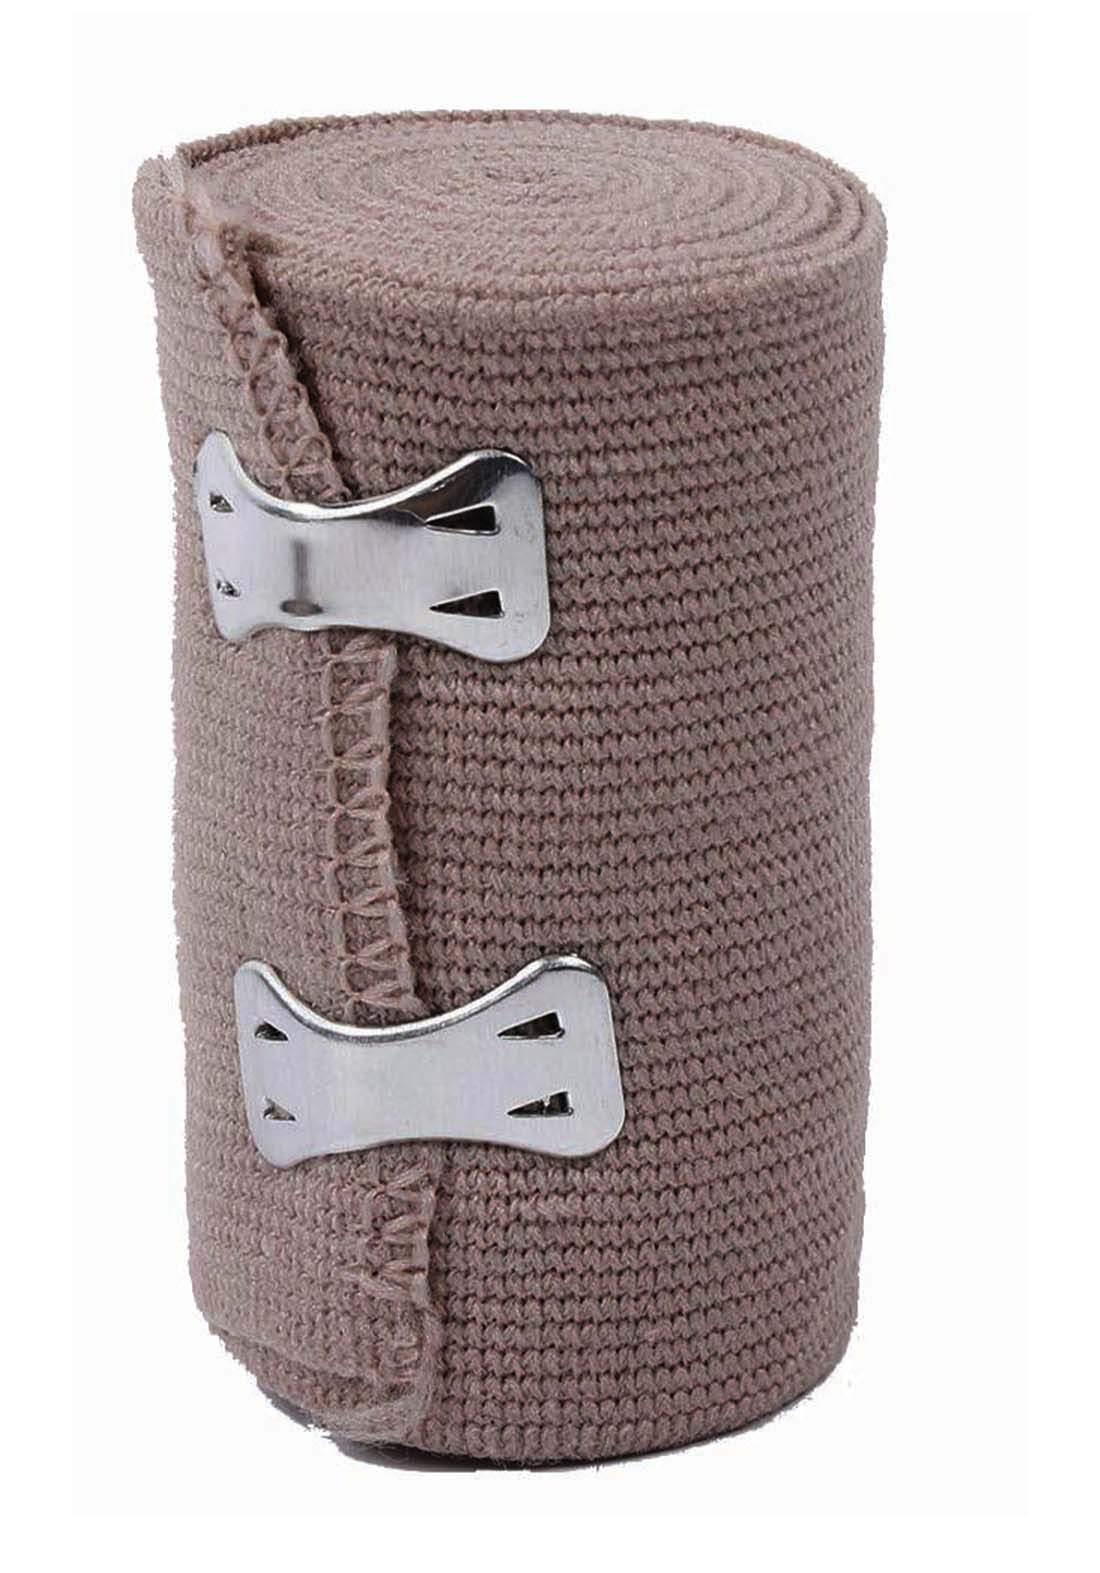 Optimal High elastic bandage 7.5cm*4.5m ضمادات طبية مطاطة بمشبك معدني